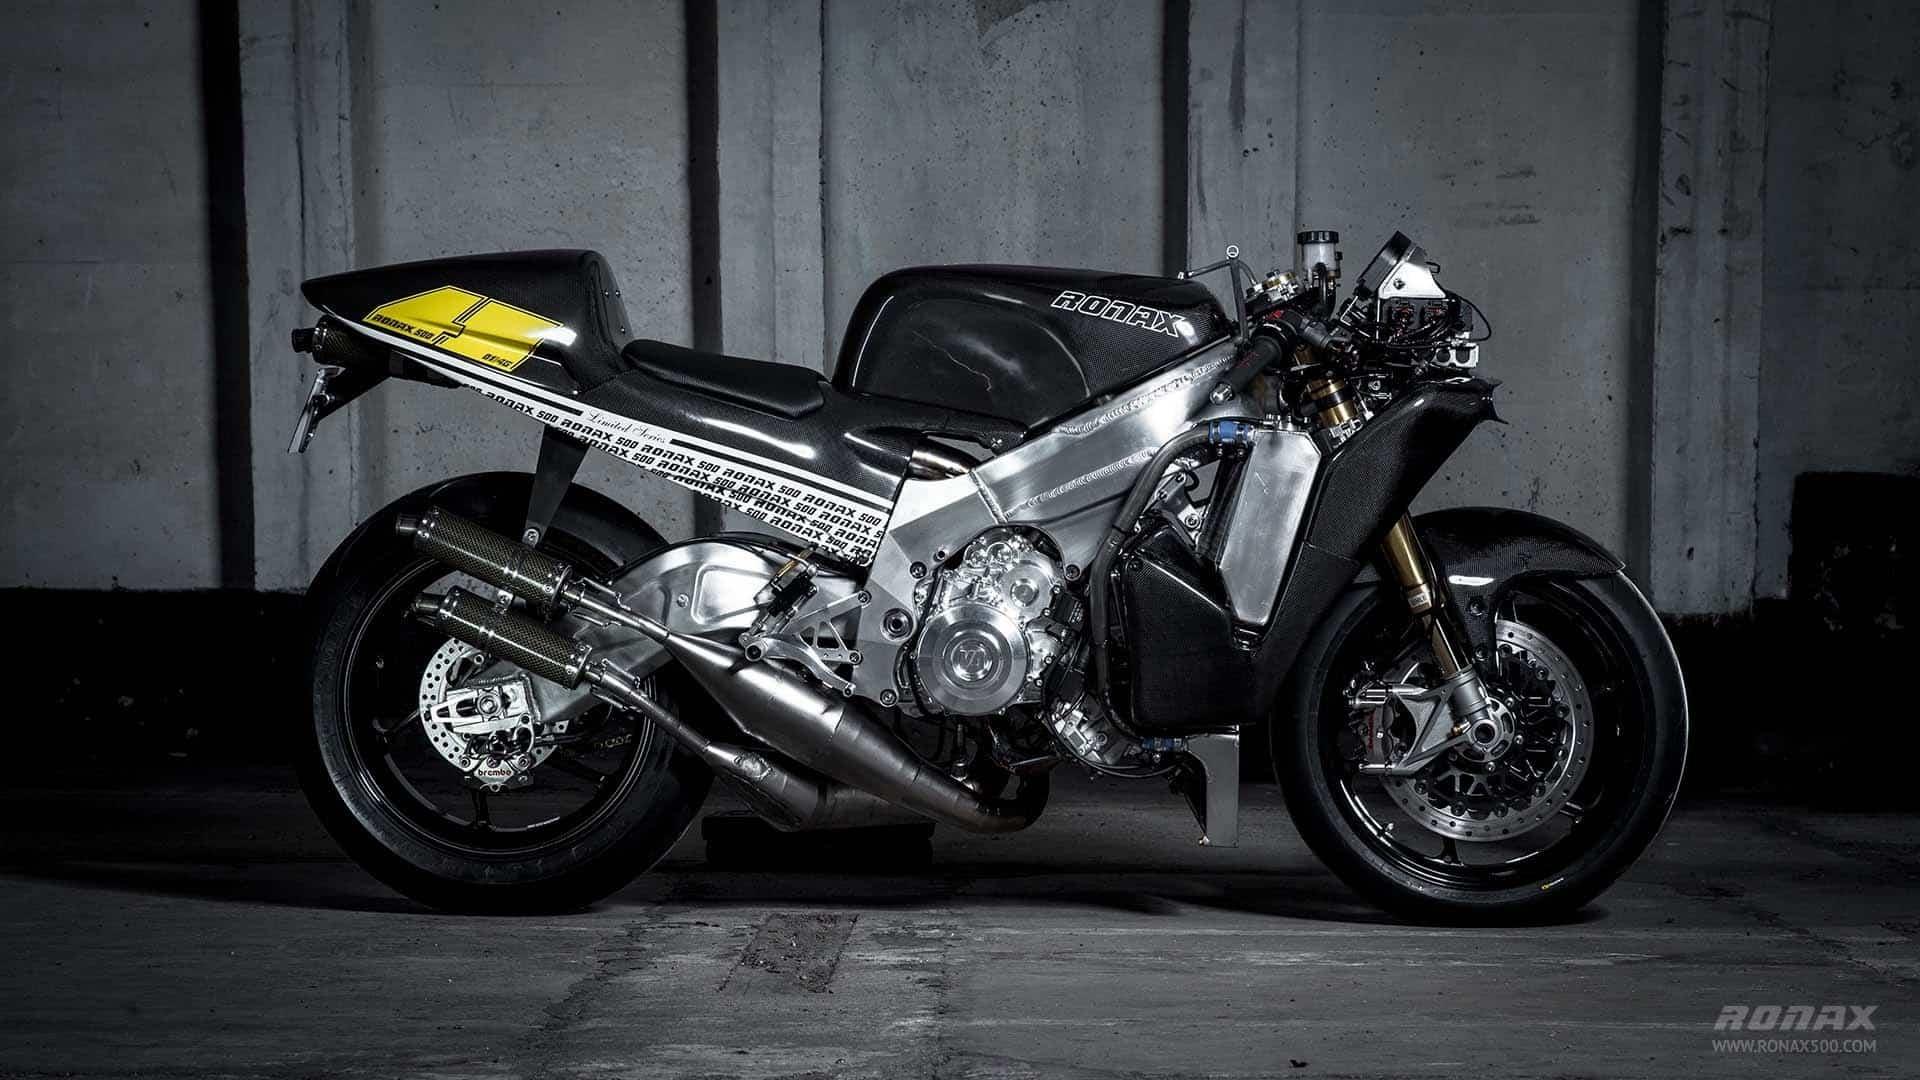 Ronax-500-Motorbike 5